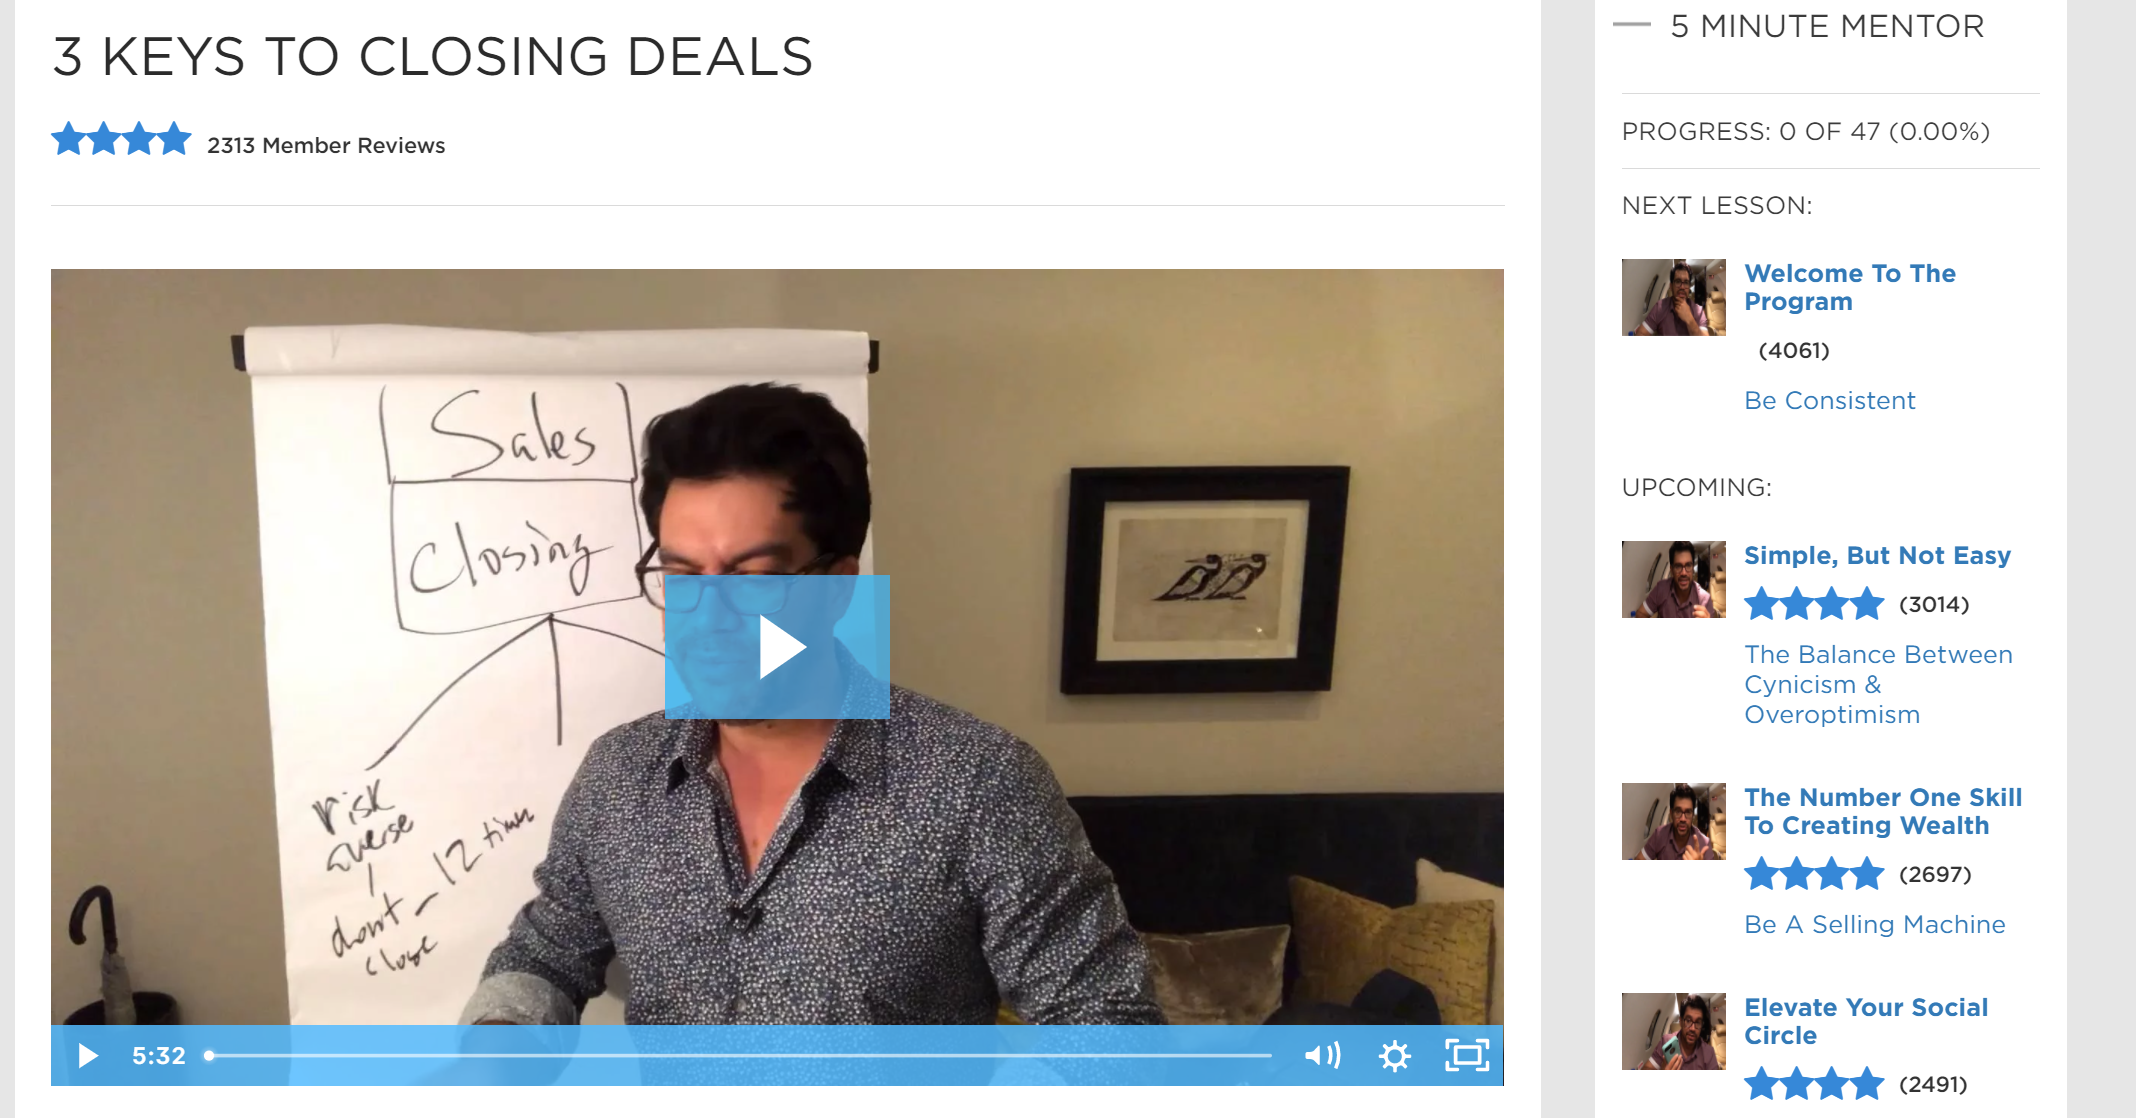 tai lopez closing deals